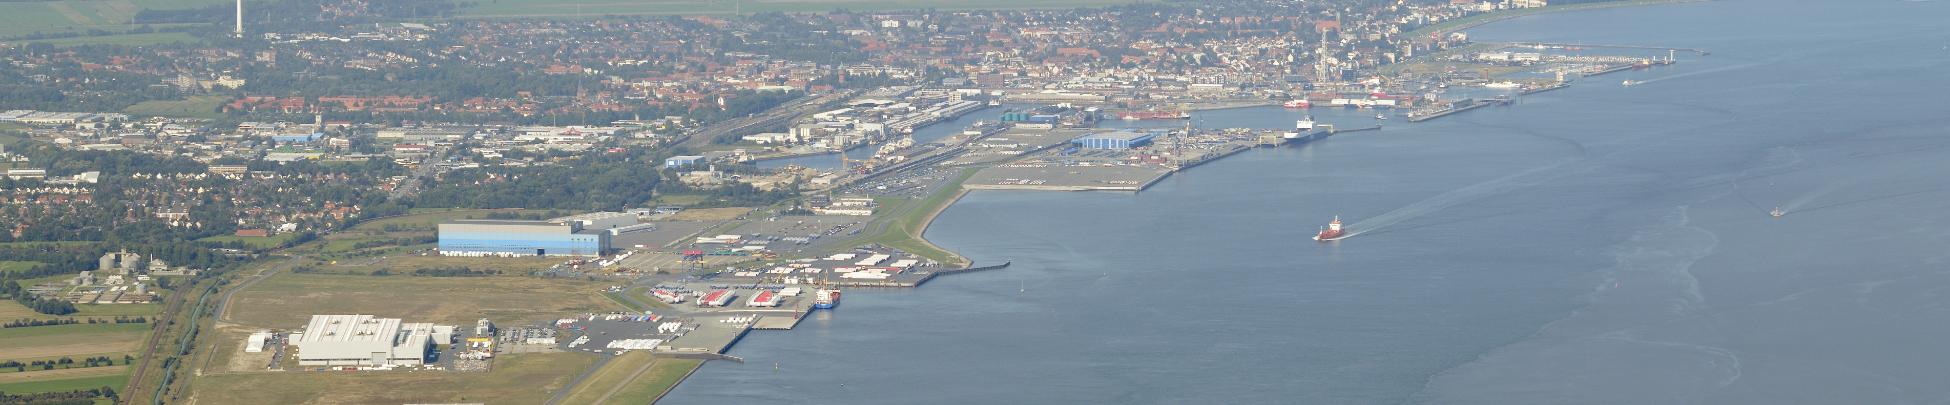 https://www.seaports.de/content/uploads/cuxhaven_banner2.jpg